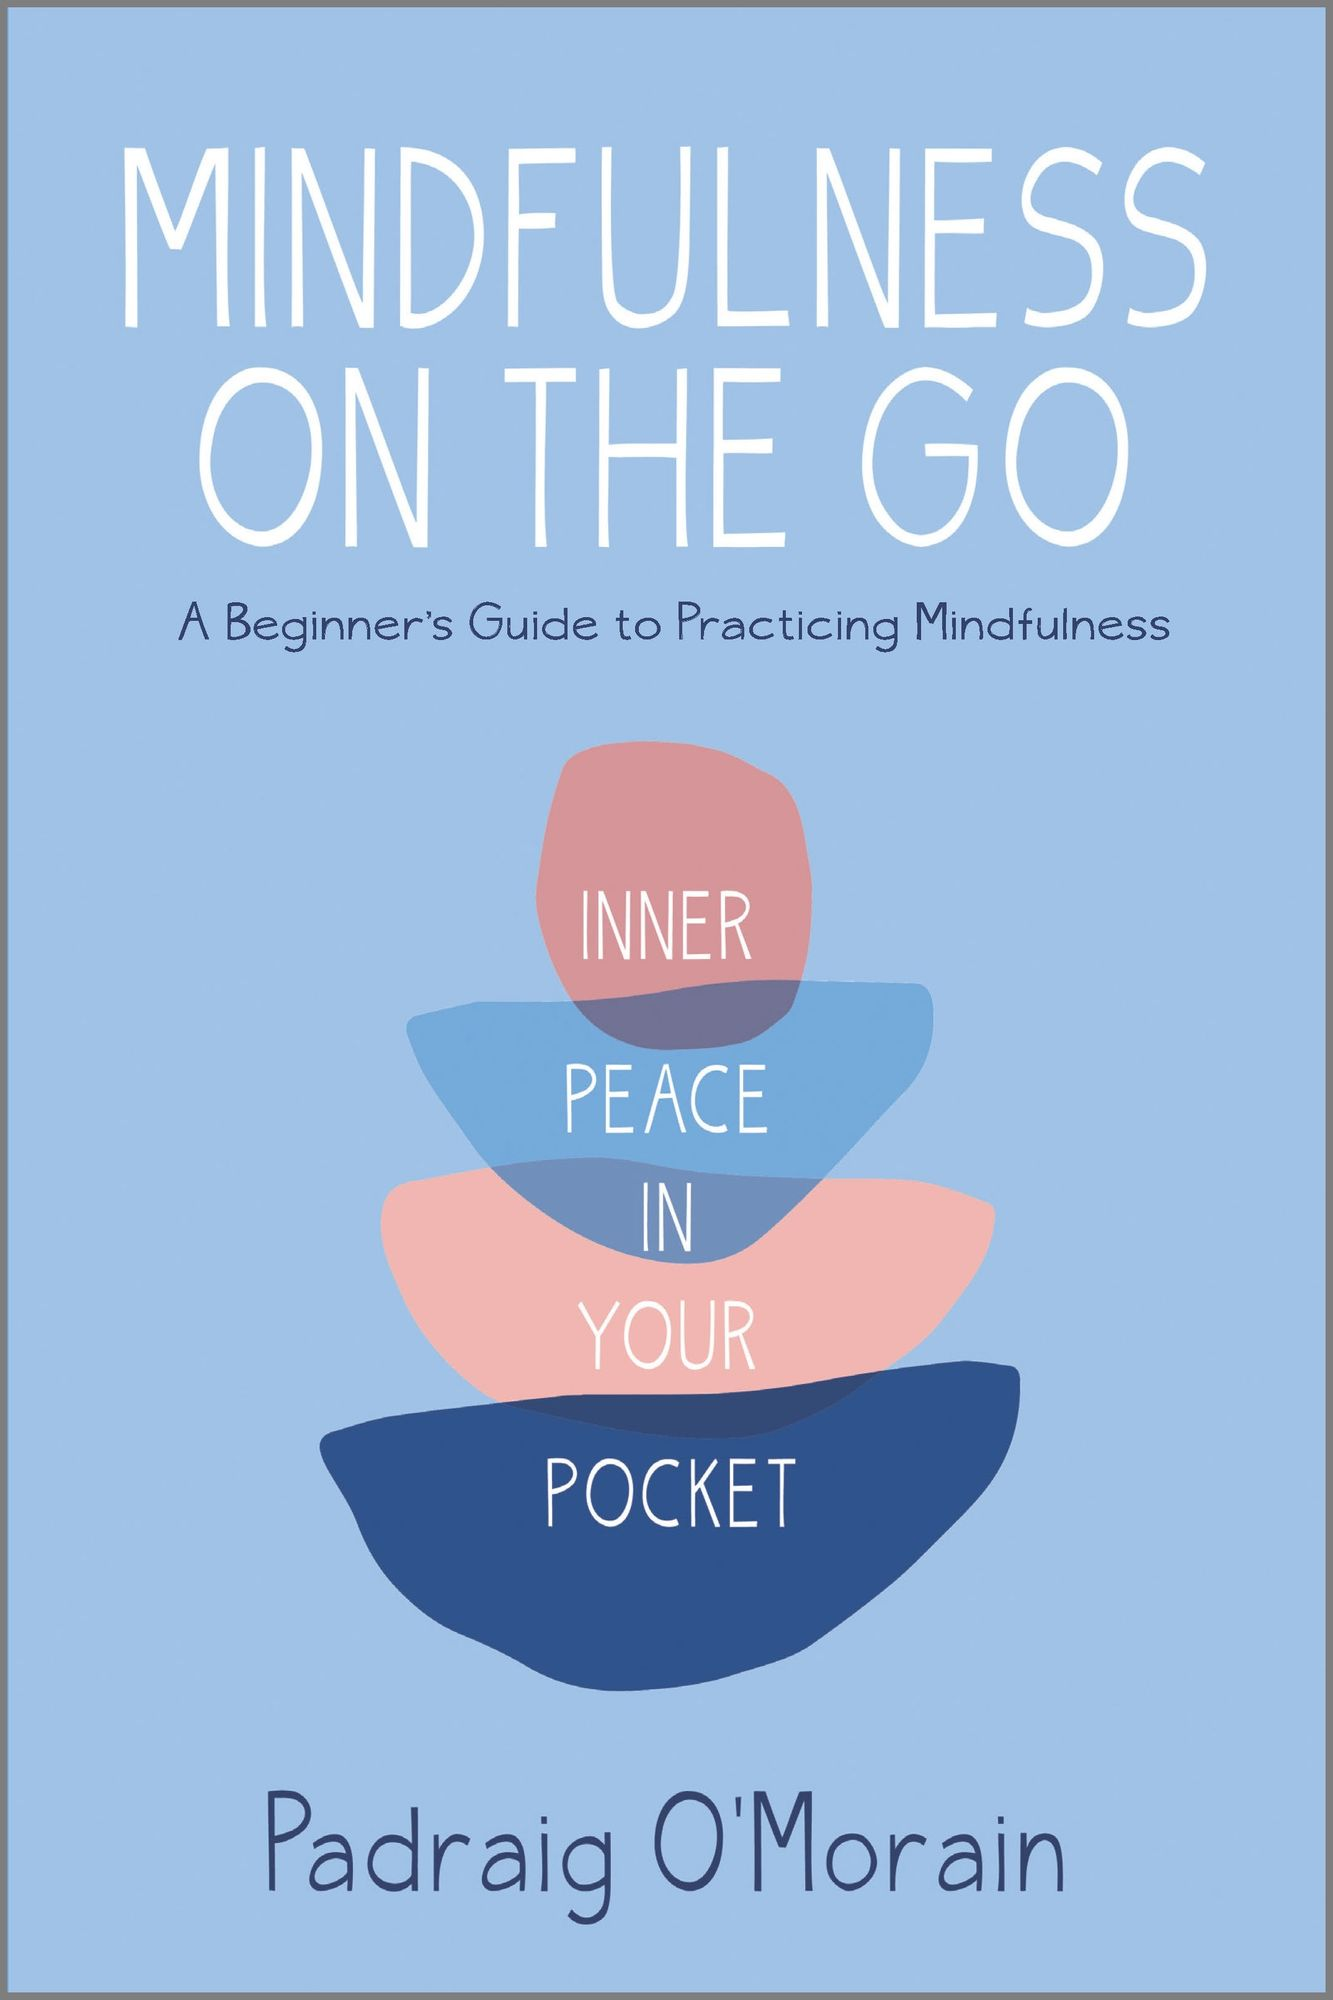 Mindfuless on the Go by Padraig O'Morain